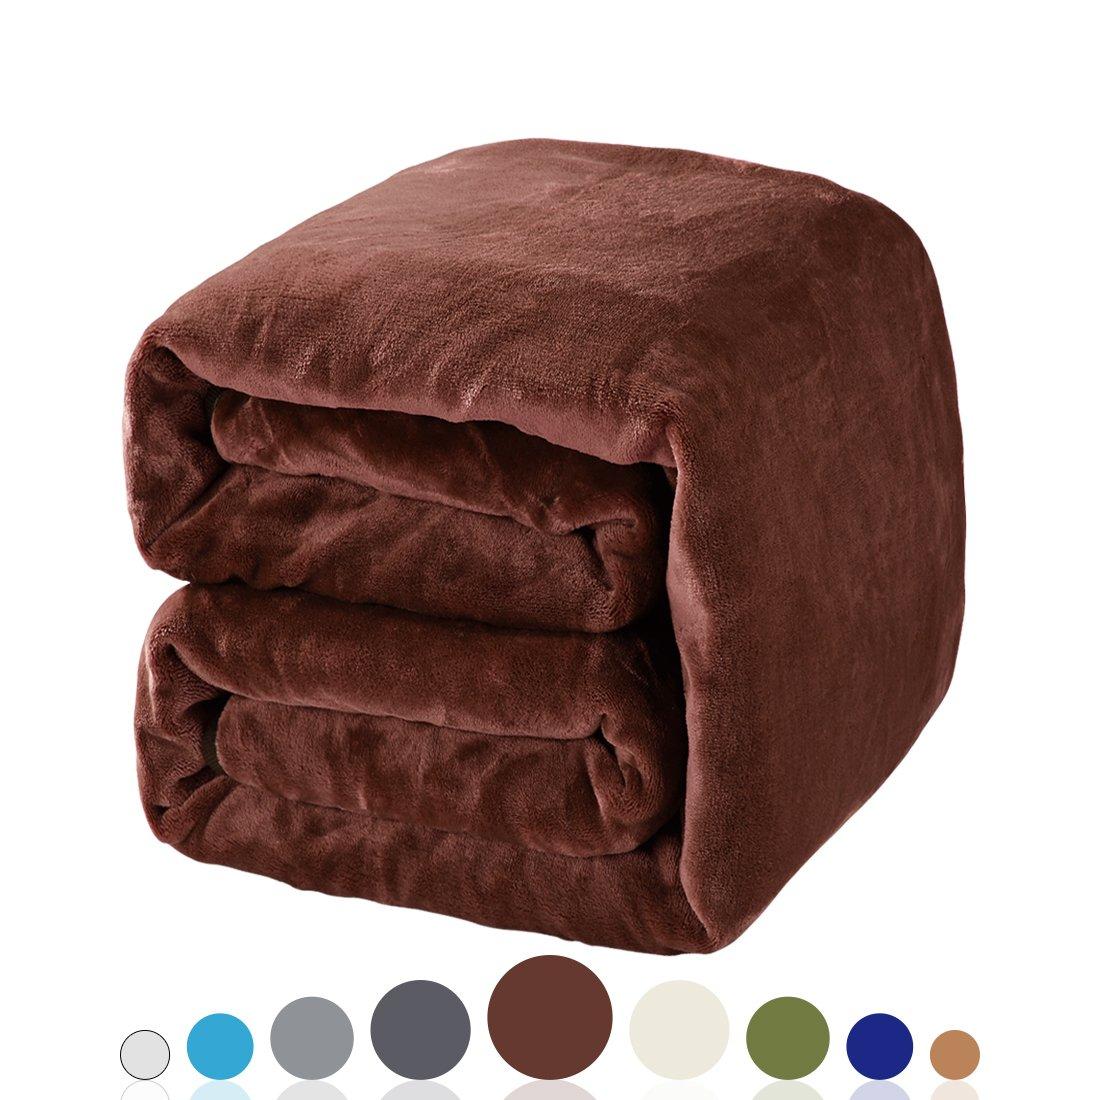 Balichun Luxury 330 GSM Fleece Blanket Super Soft Warm Fuzzy Lightweight Bed or Couch Blanket Twin/Queen/King Size(King,Brown)